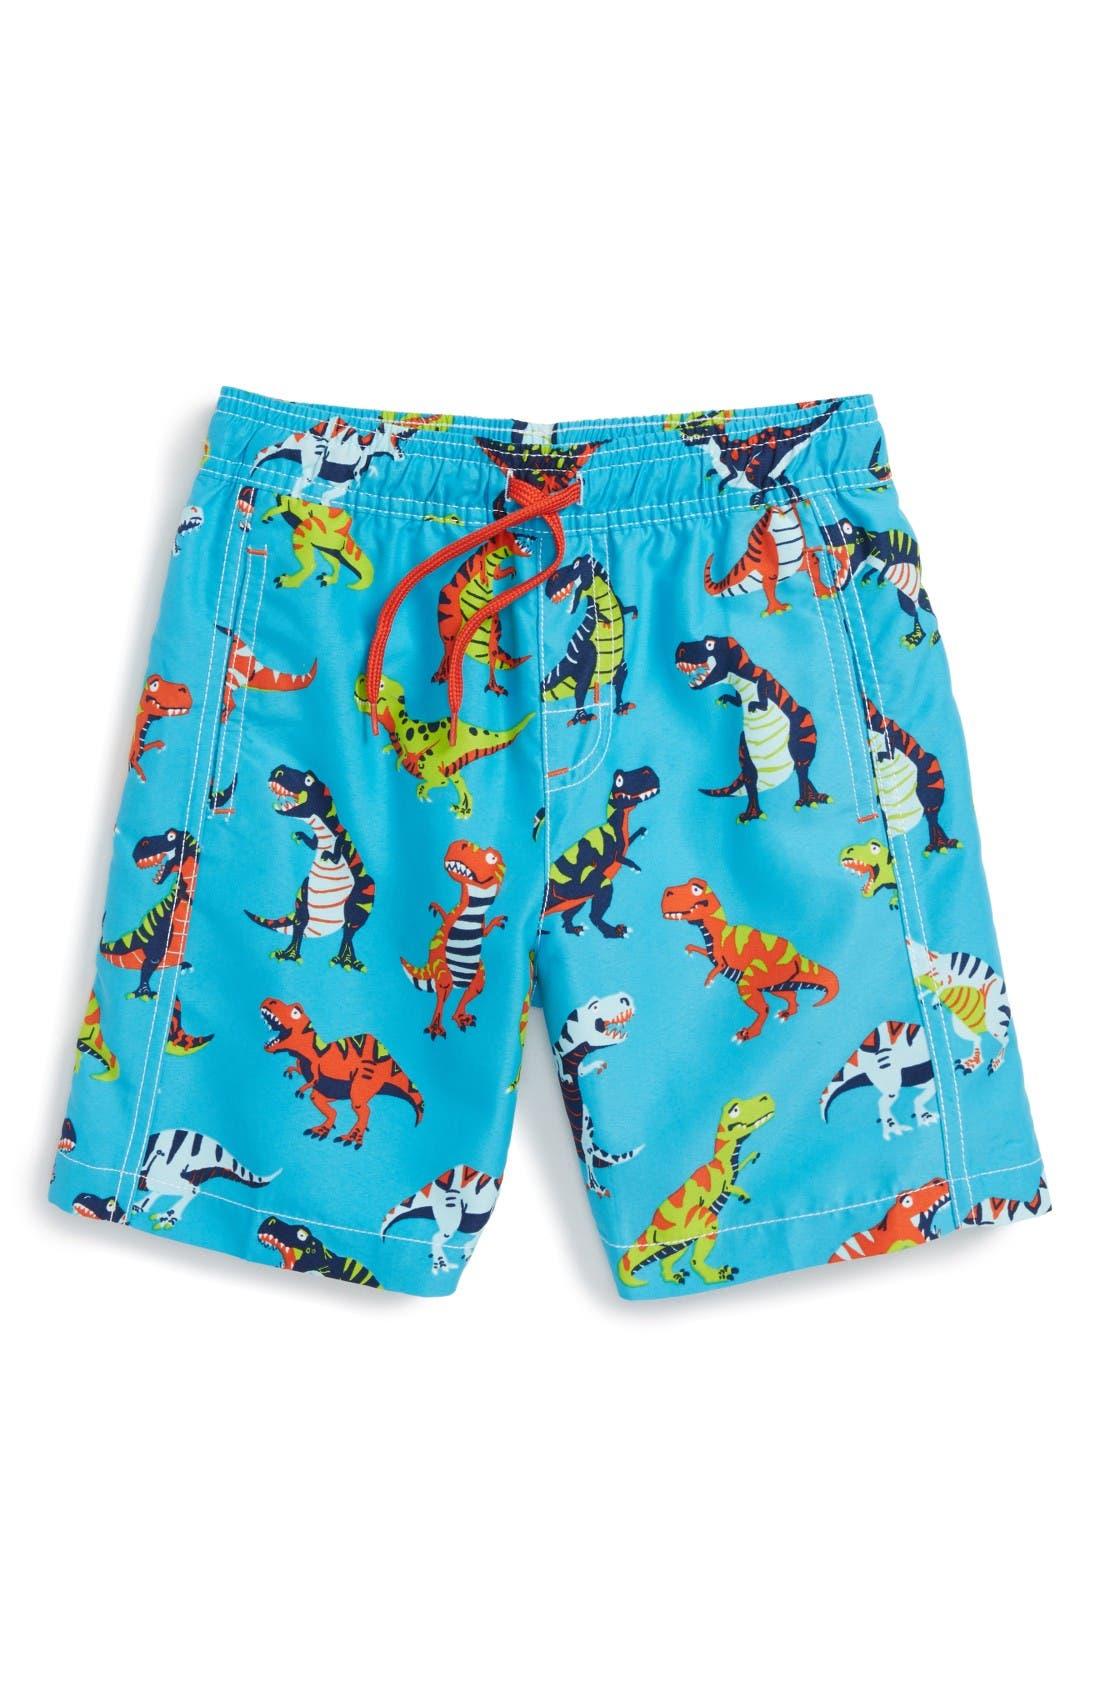 Roaring T-Rex Swim Trunks,                         Main,                         color, Blue